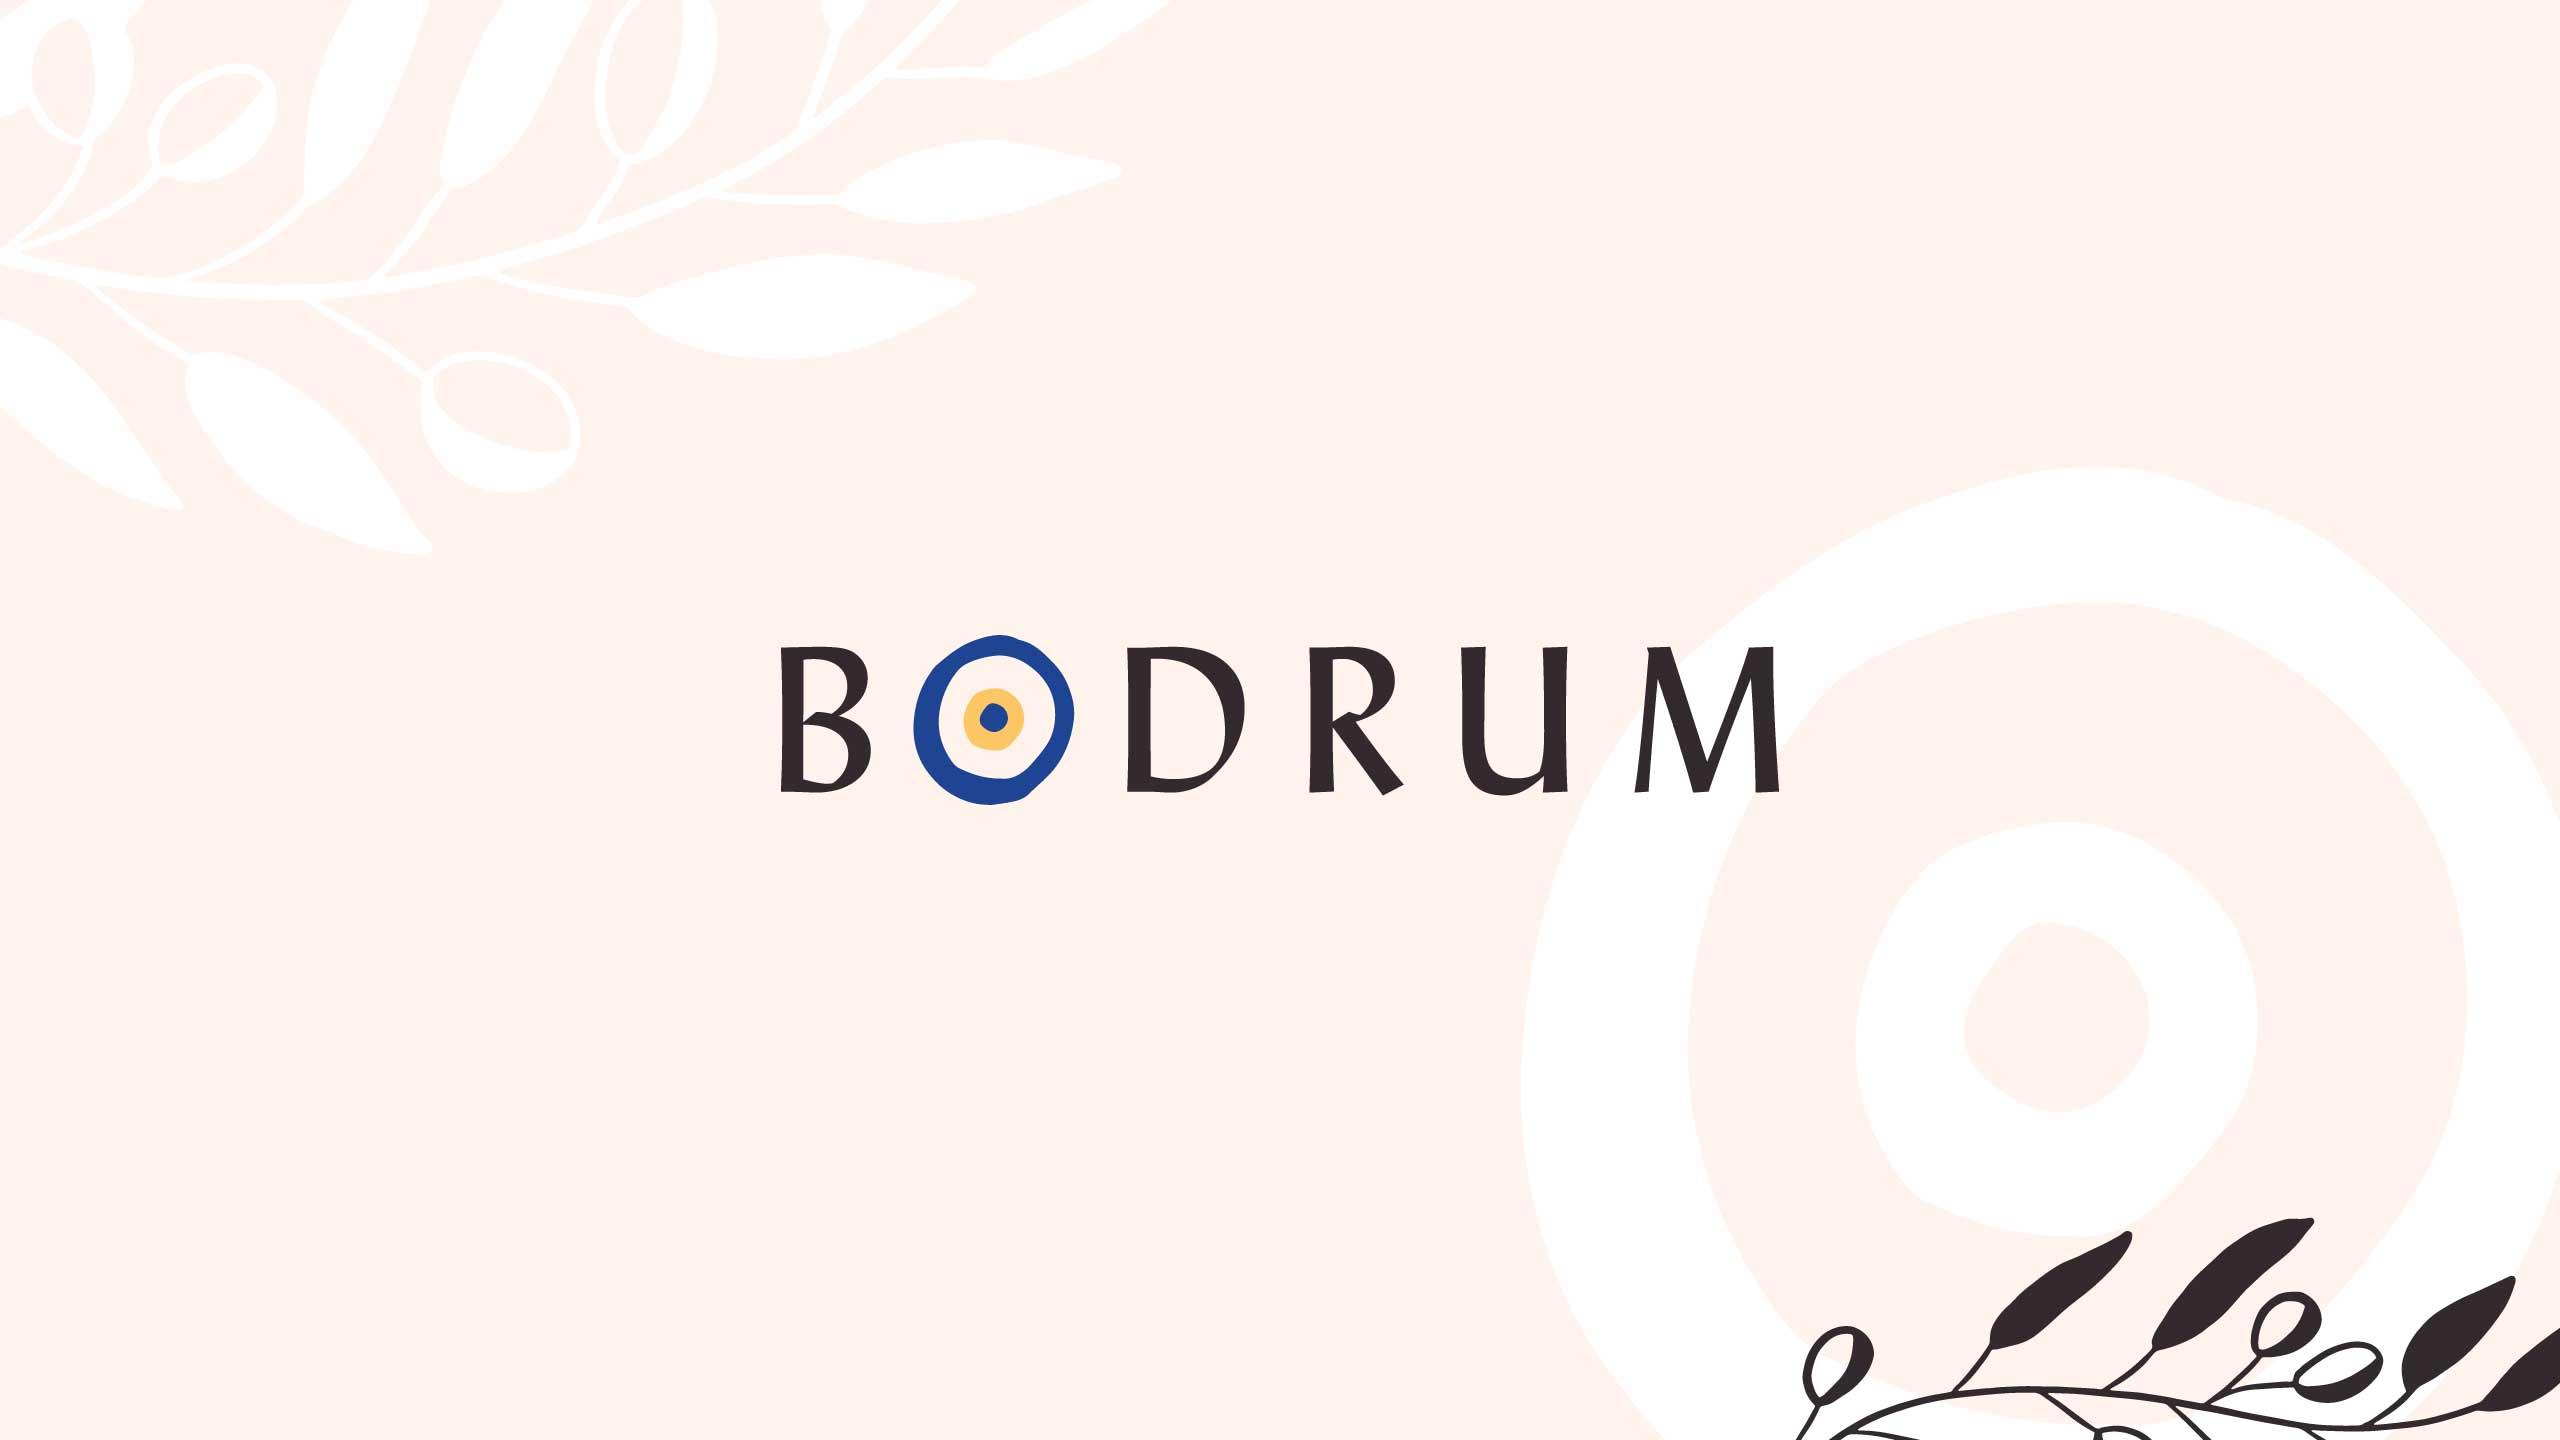 bodrum-main-brand-identity